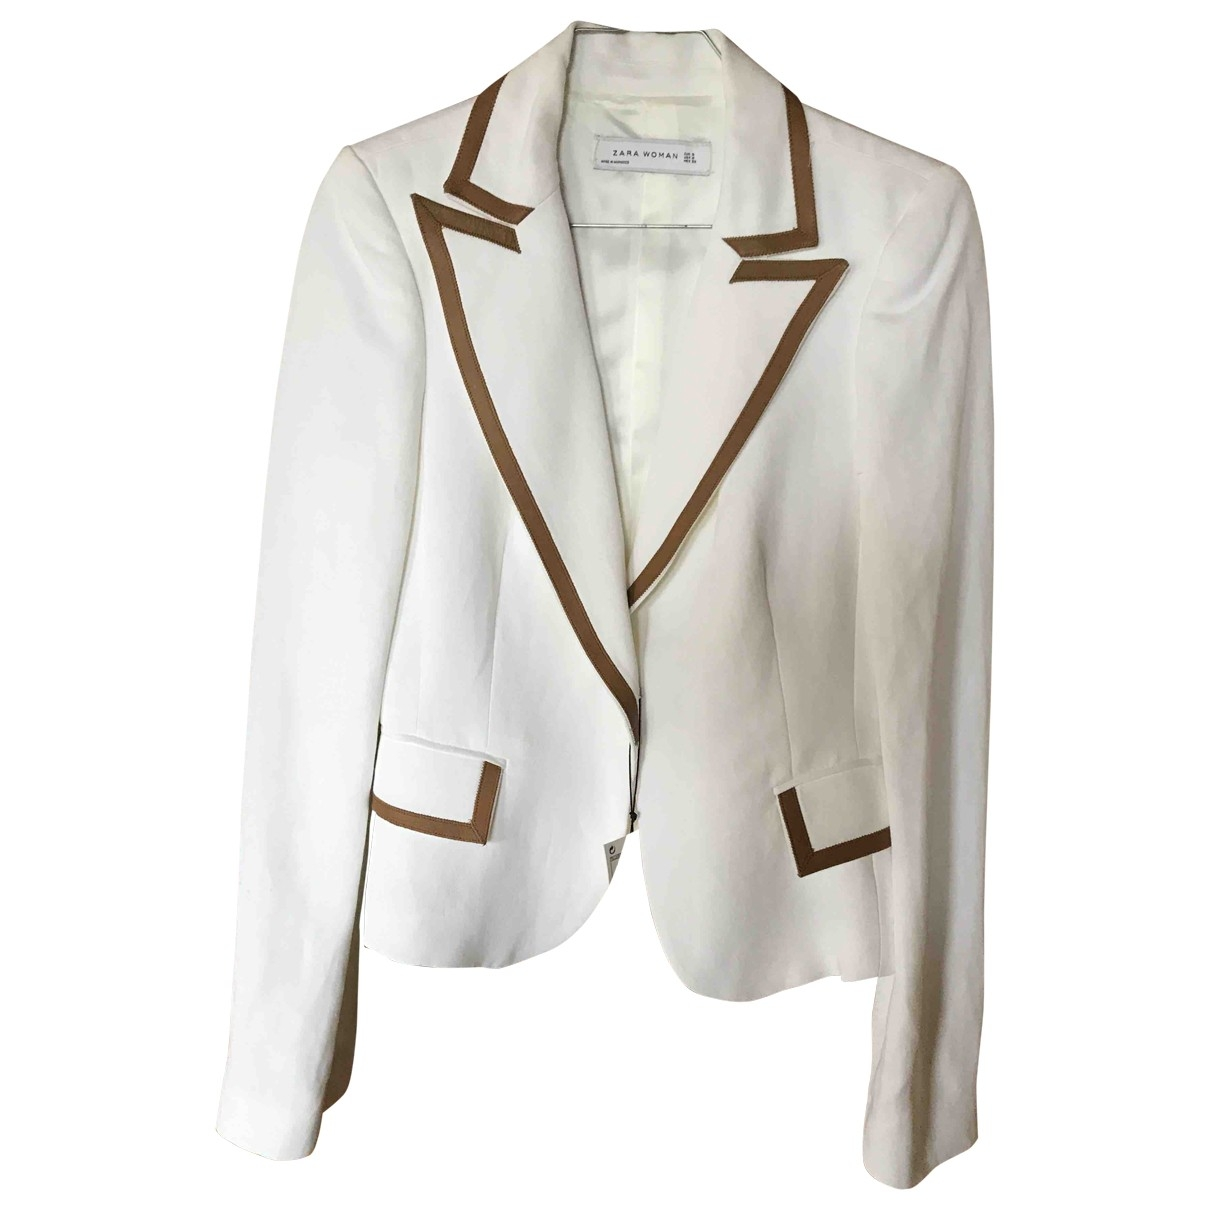 Zara - Veste   pour femme en lin - blanc